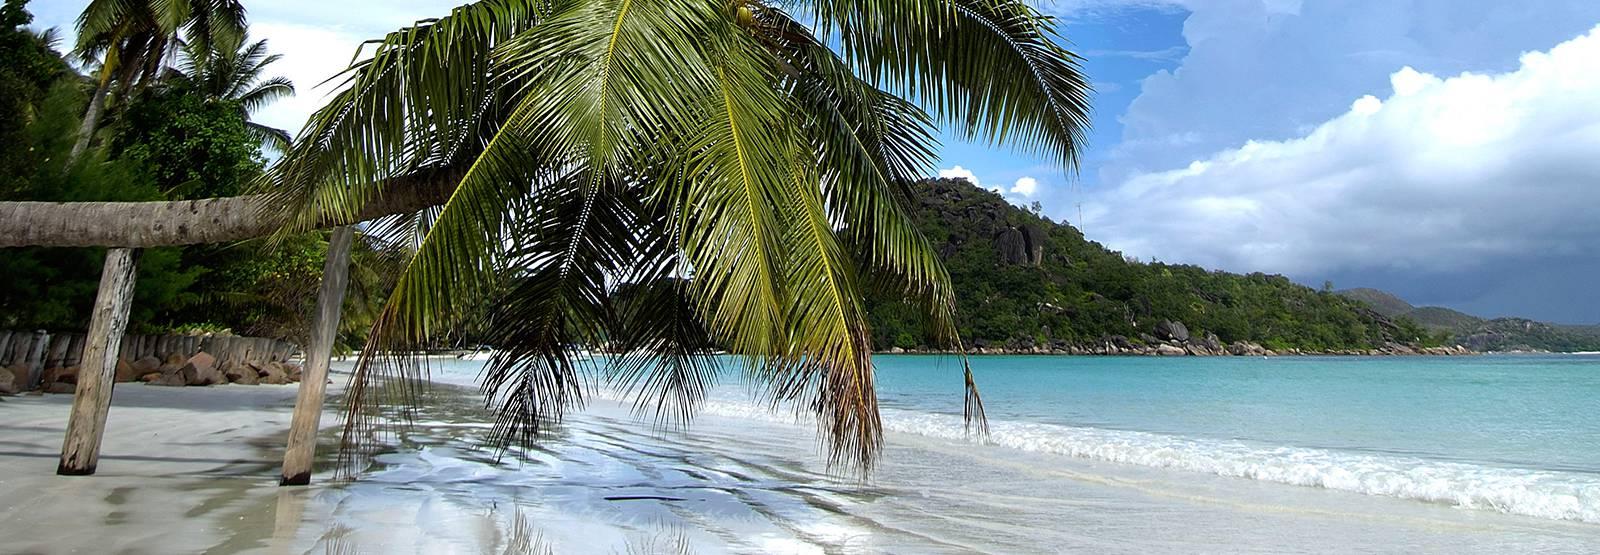 Seychelles Resorts Berjaya Praslin Resort Official Site : bp day 3034c from www.berjayahotel.com size 1600 x 555 jpeg 191kB